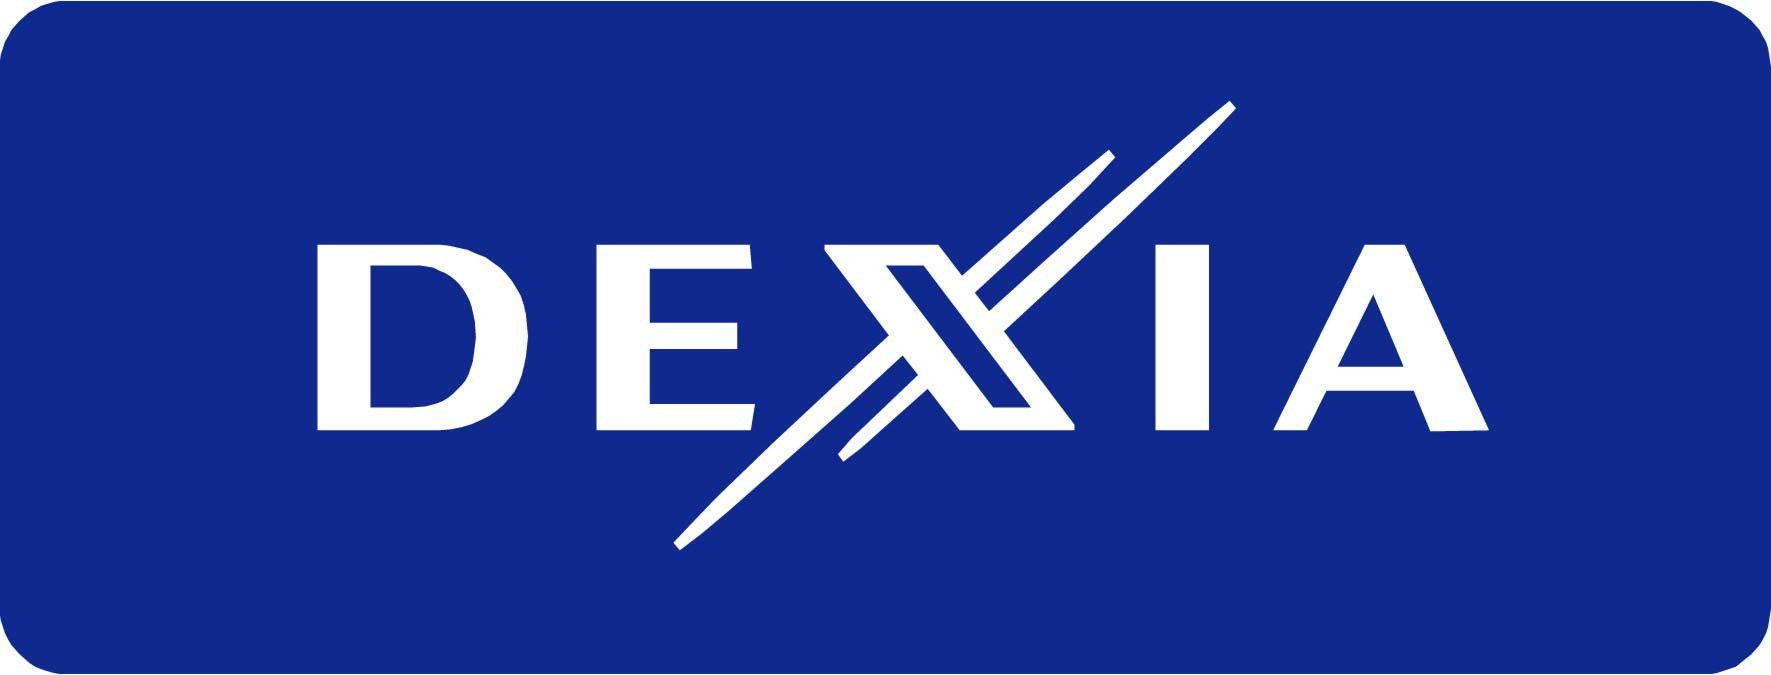 Dexia logo large.jpg